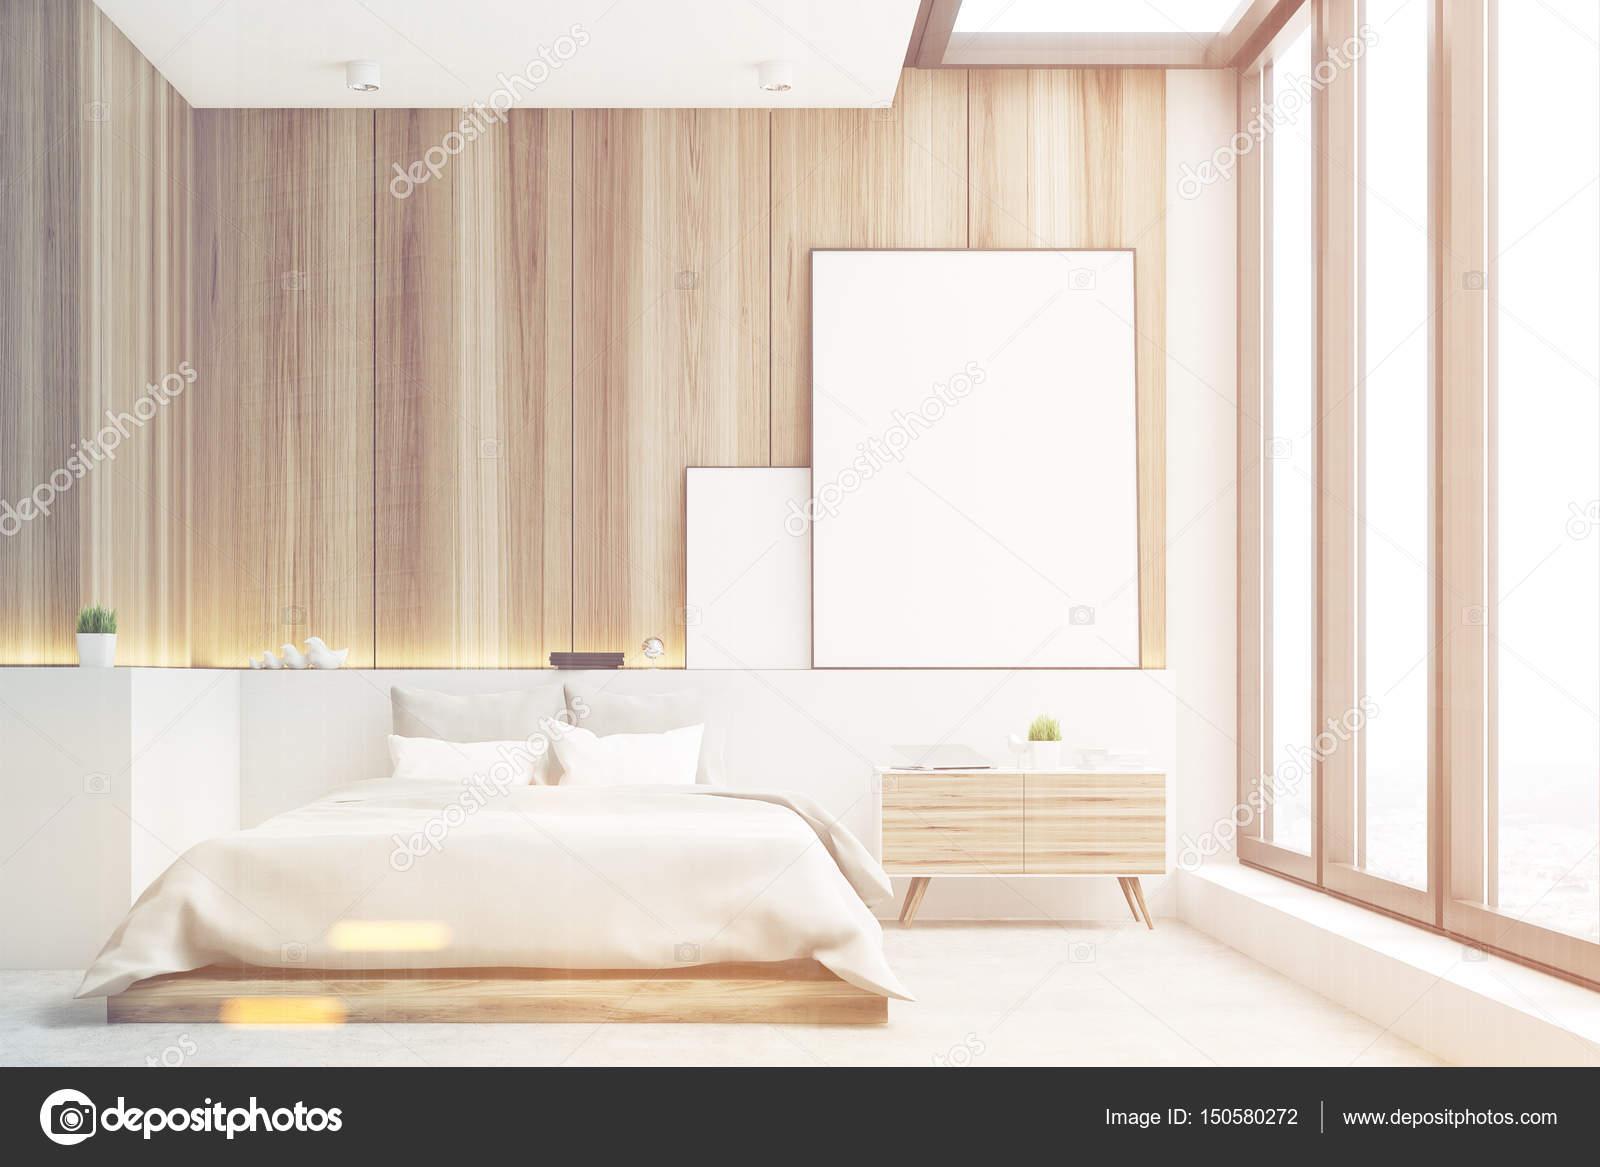 Lichte slaapkamer, hout, voorzijde, afgezwakt — Stockfoto ...